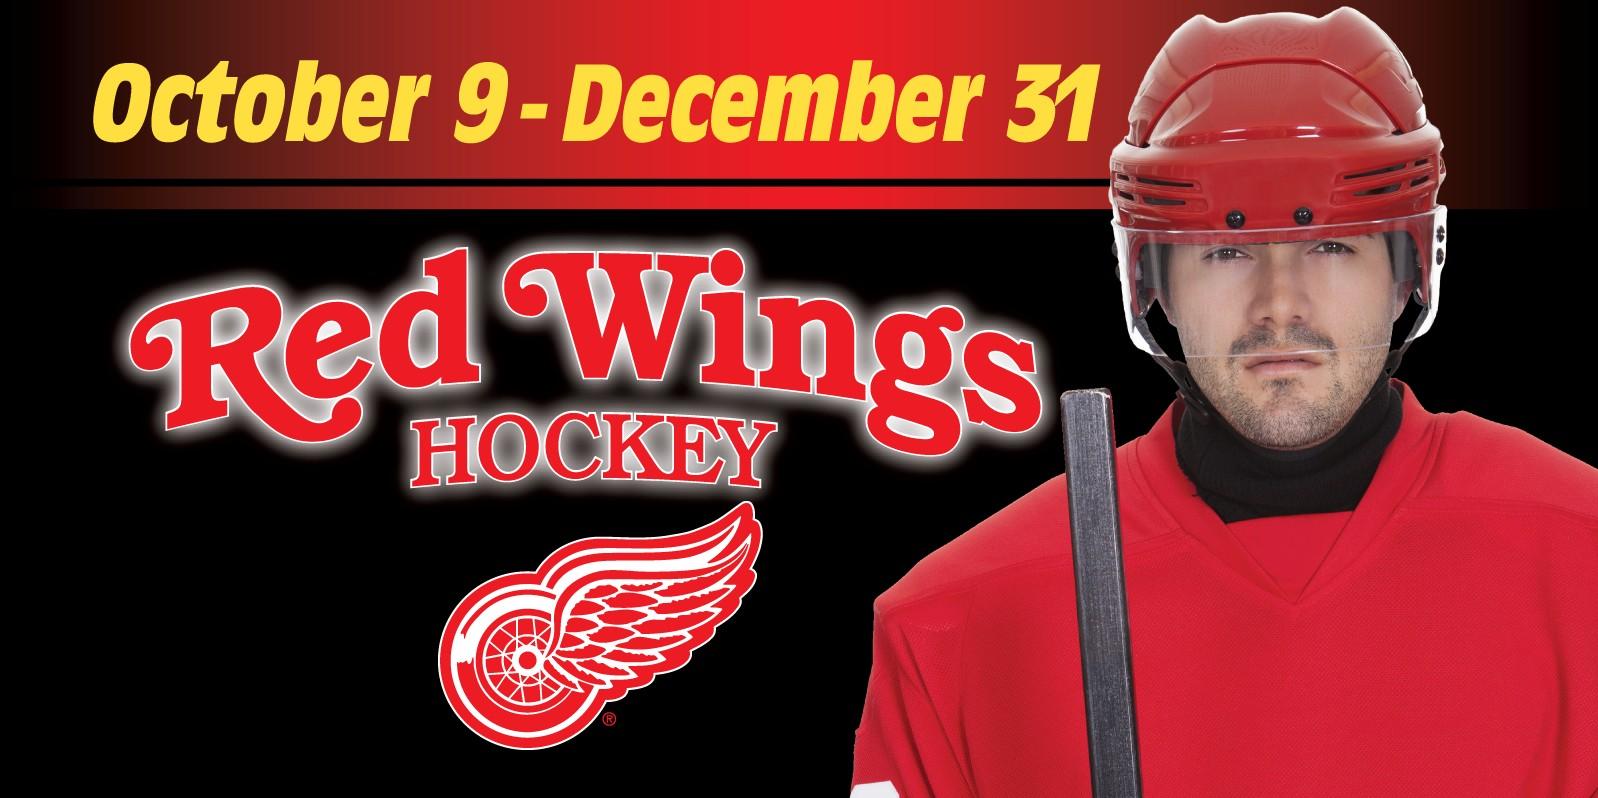 2014 Red Wings Hockey Web Image